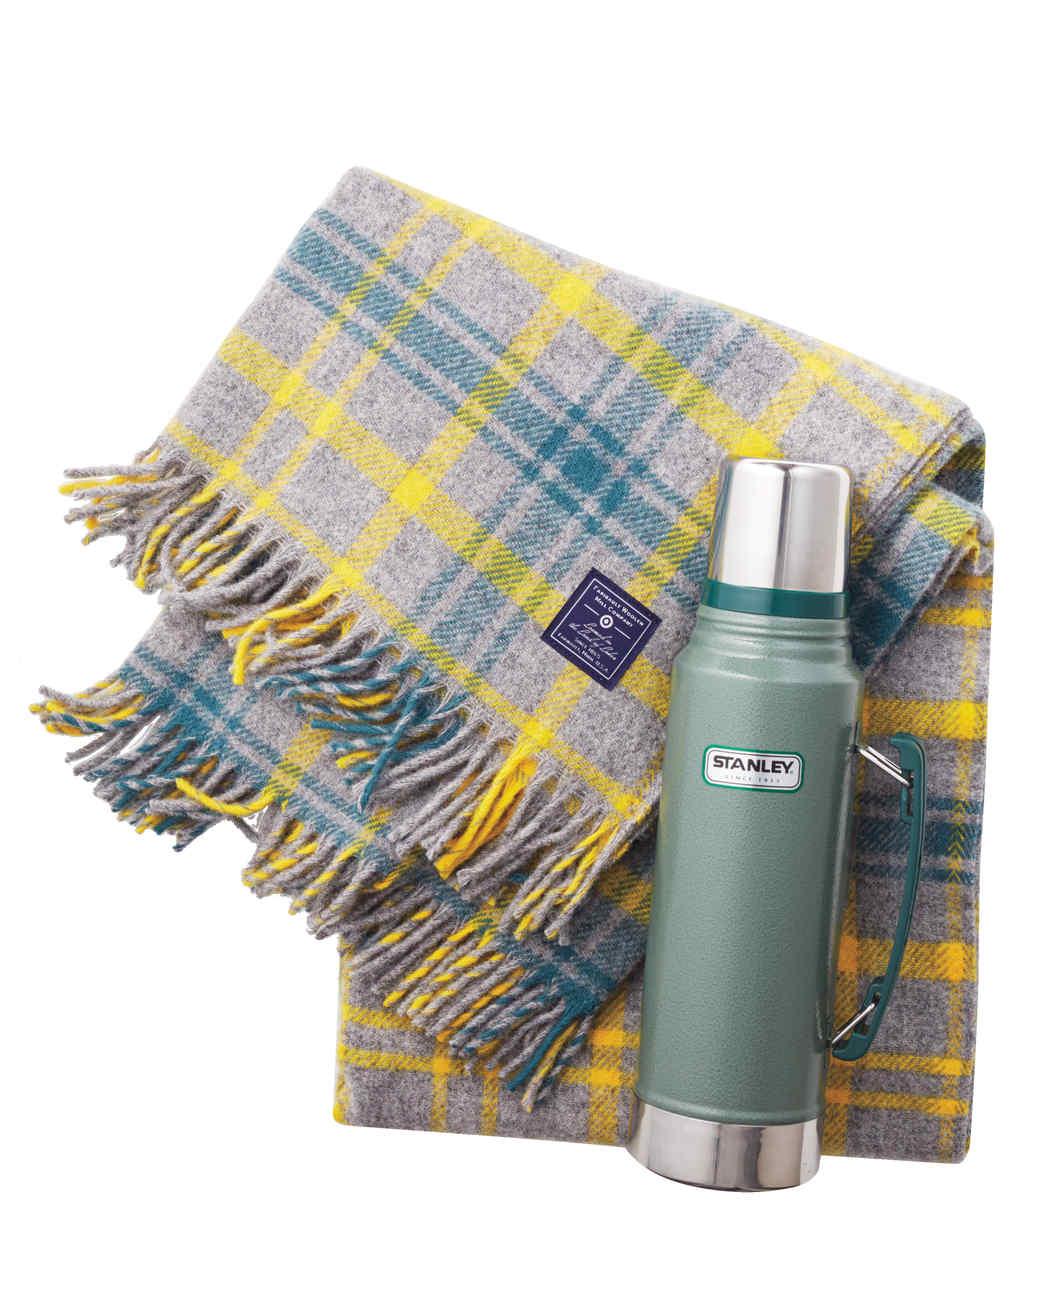 faribault-target-wool-plaid-blanket-with-thermos-088-d112494.jpg